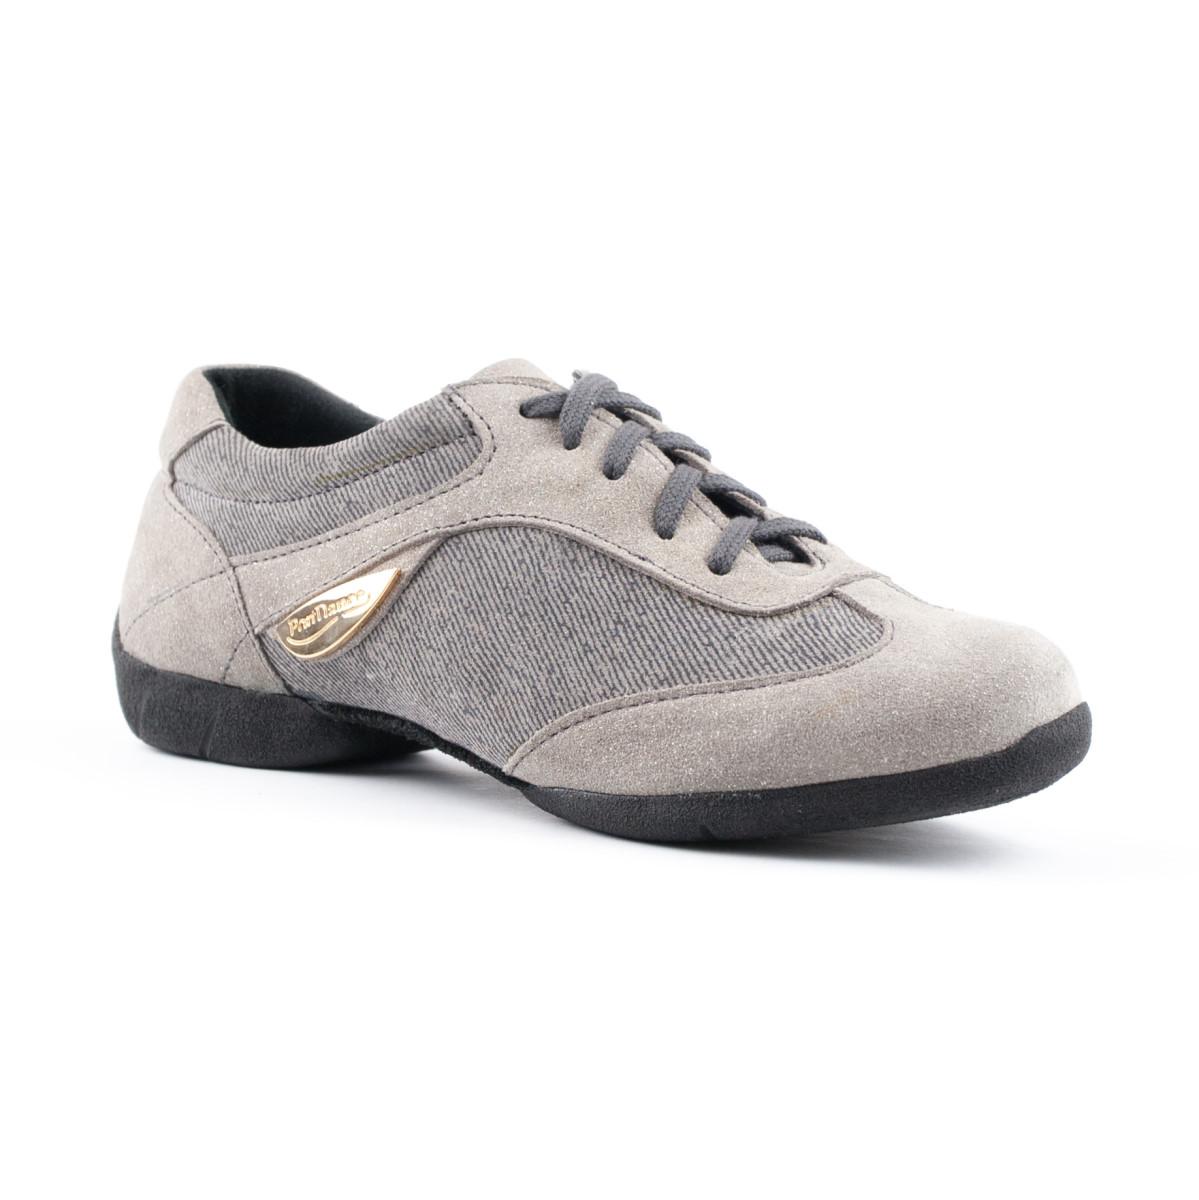 uk availability 0e40f 8da52 PortDance - Ladies Dance Sneakers PD07 Fashion - Denim/Suede